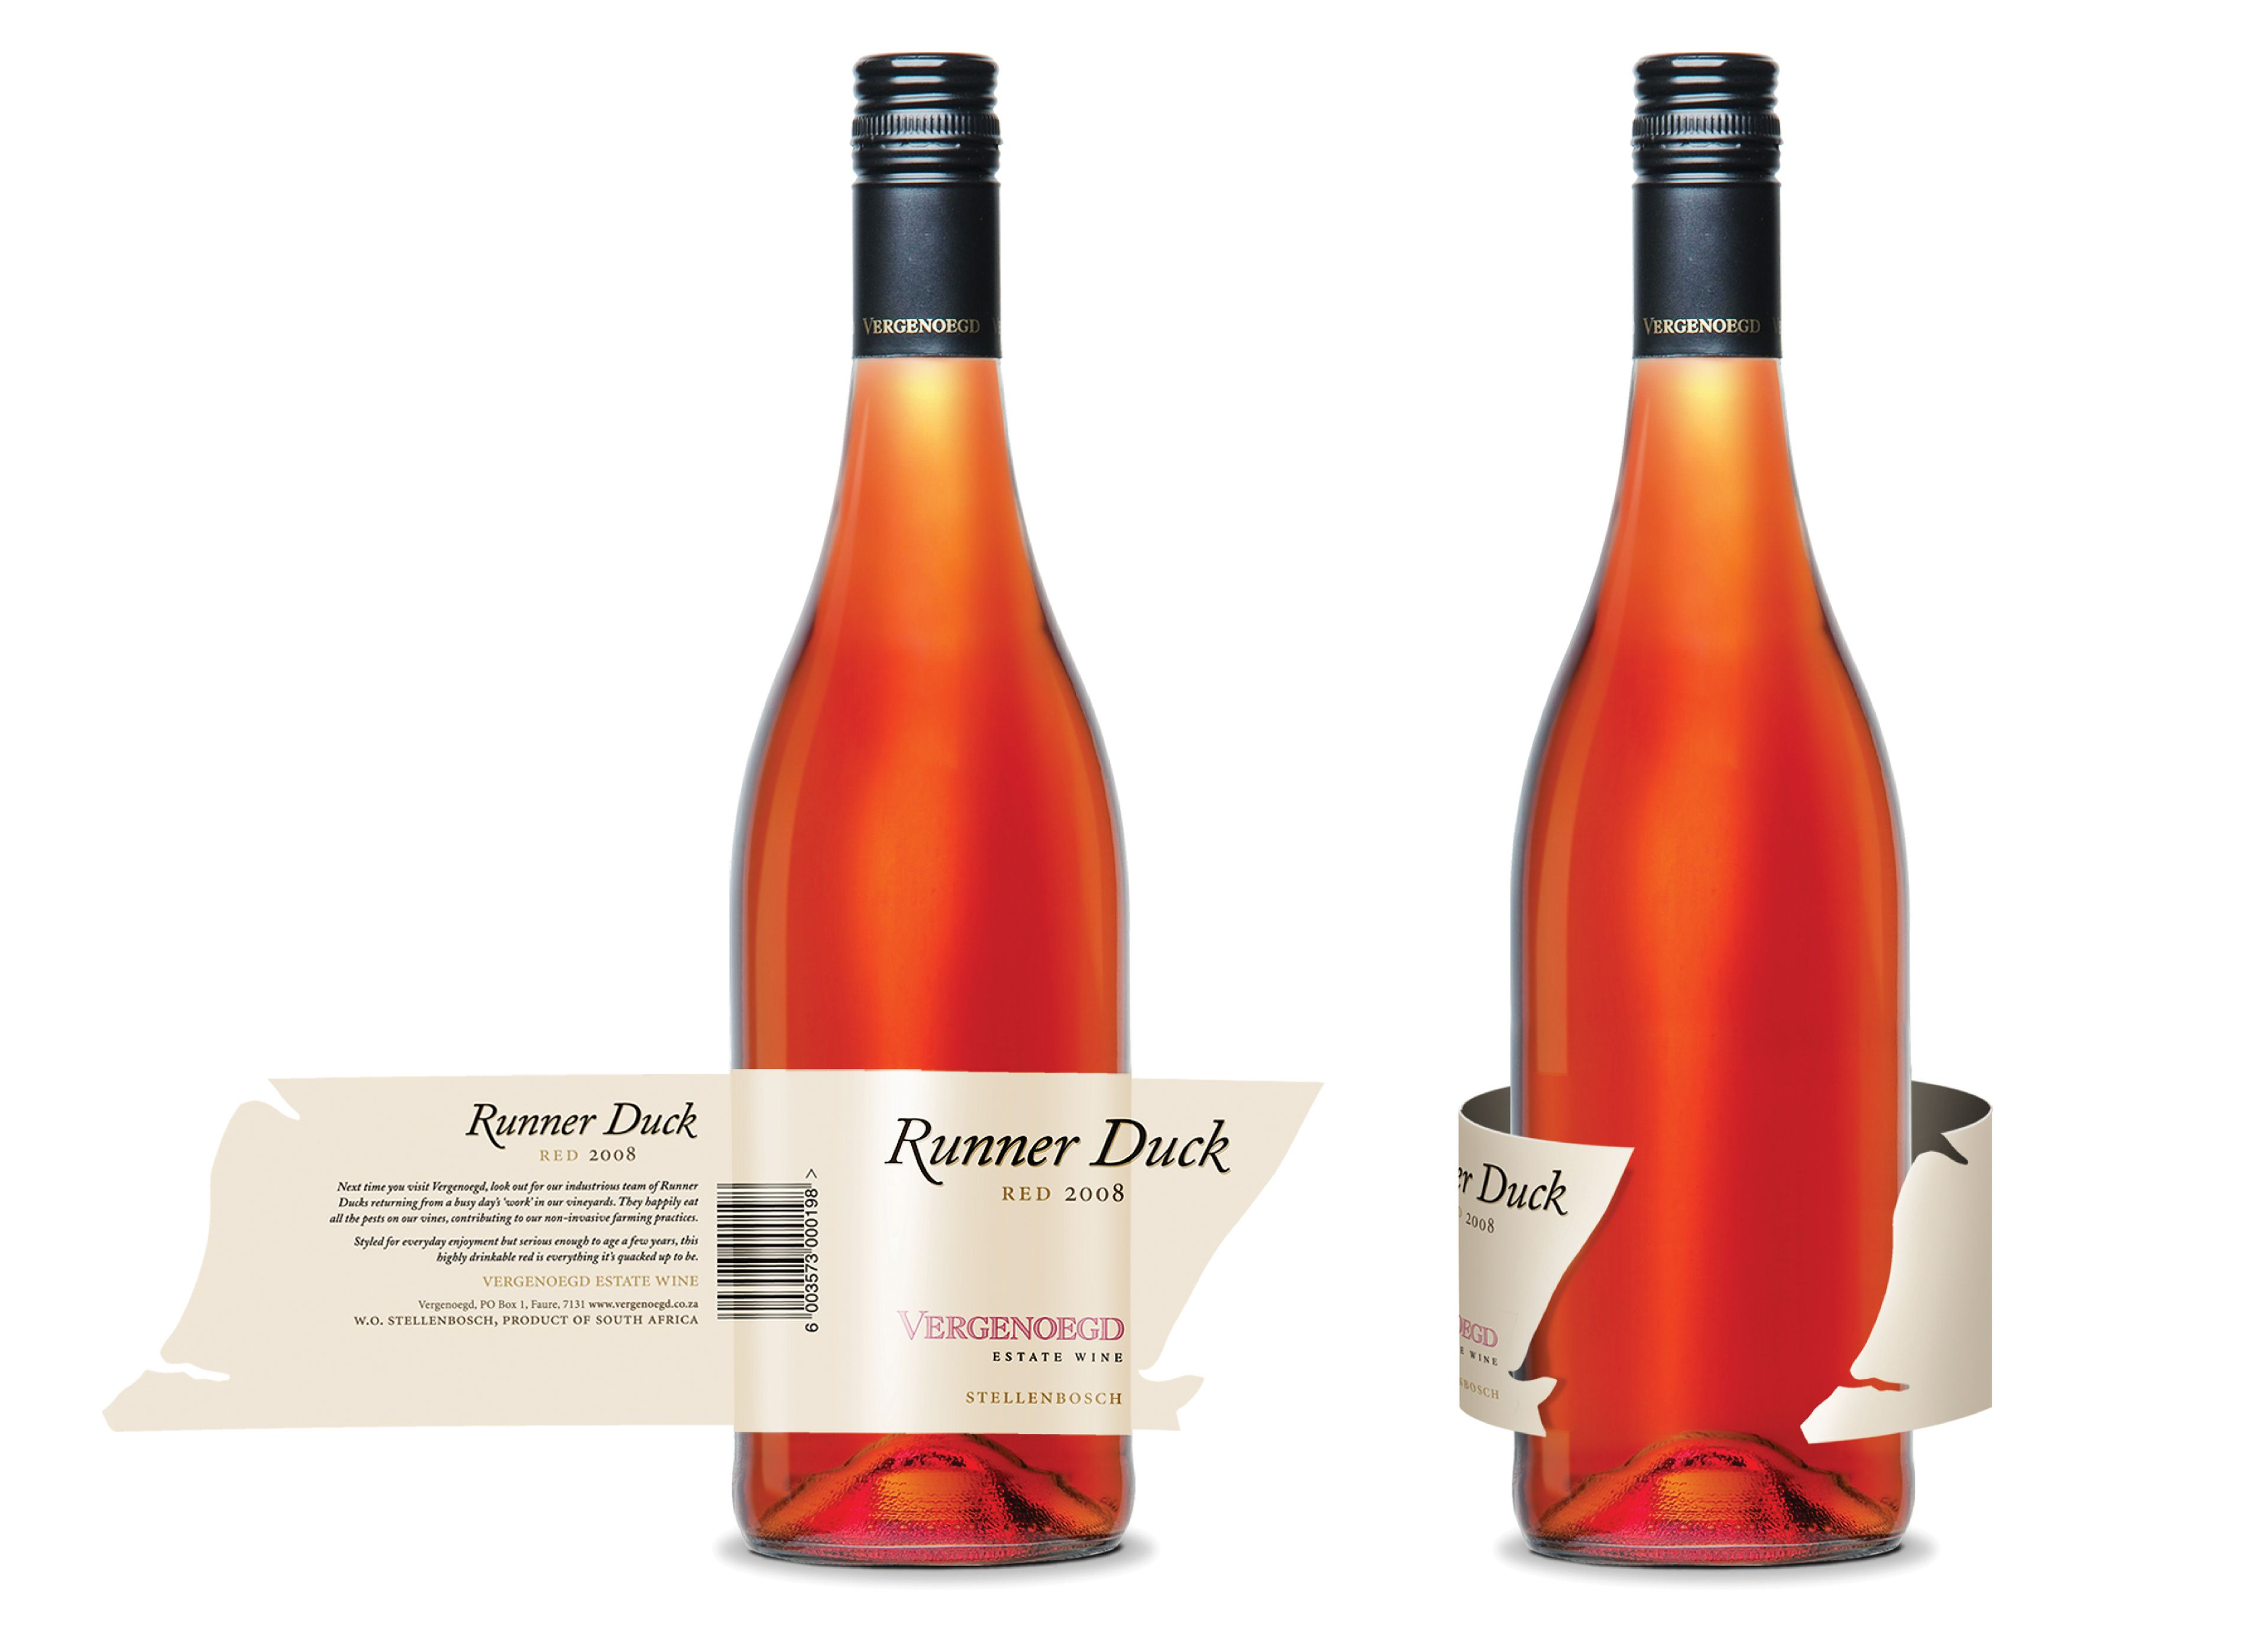 Image Result For Wrap Around Wine Label Wine Bottle Wine Label Wine